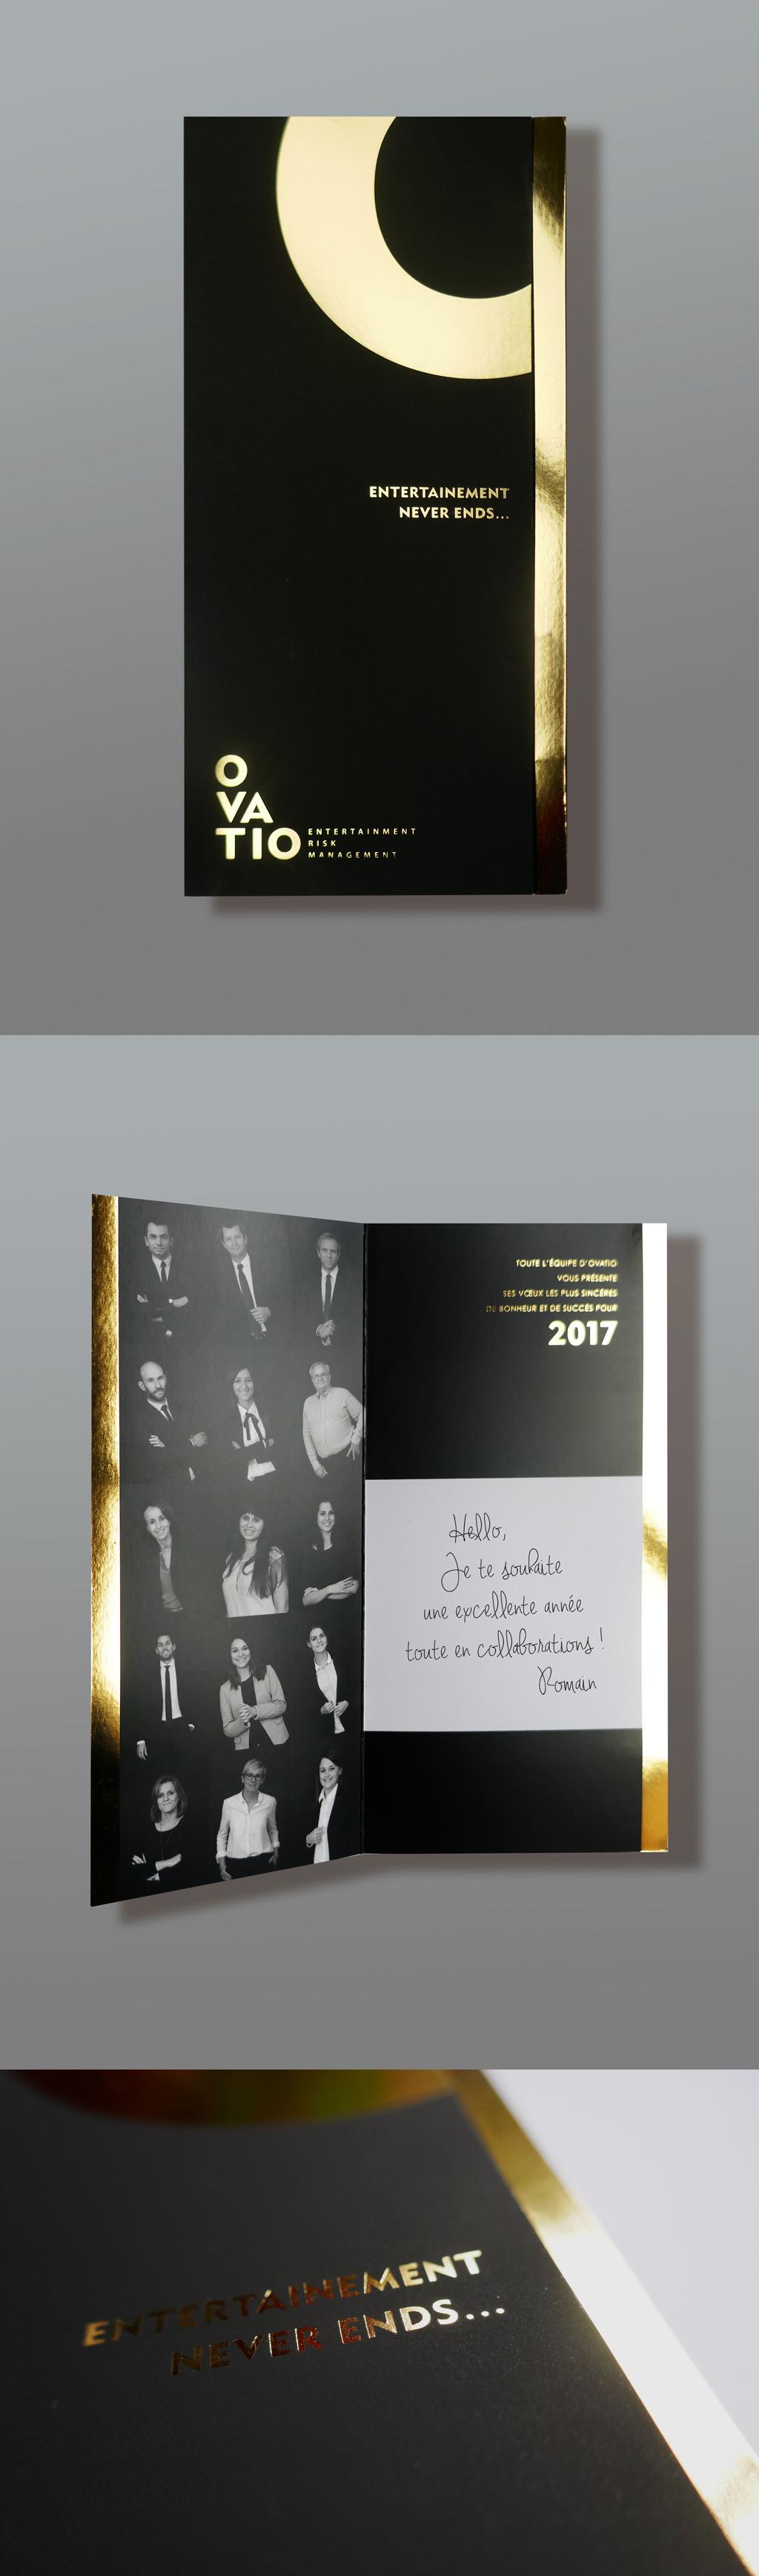 edition-ovatio-carte-voeux